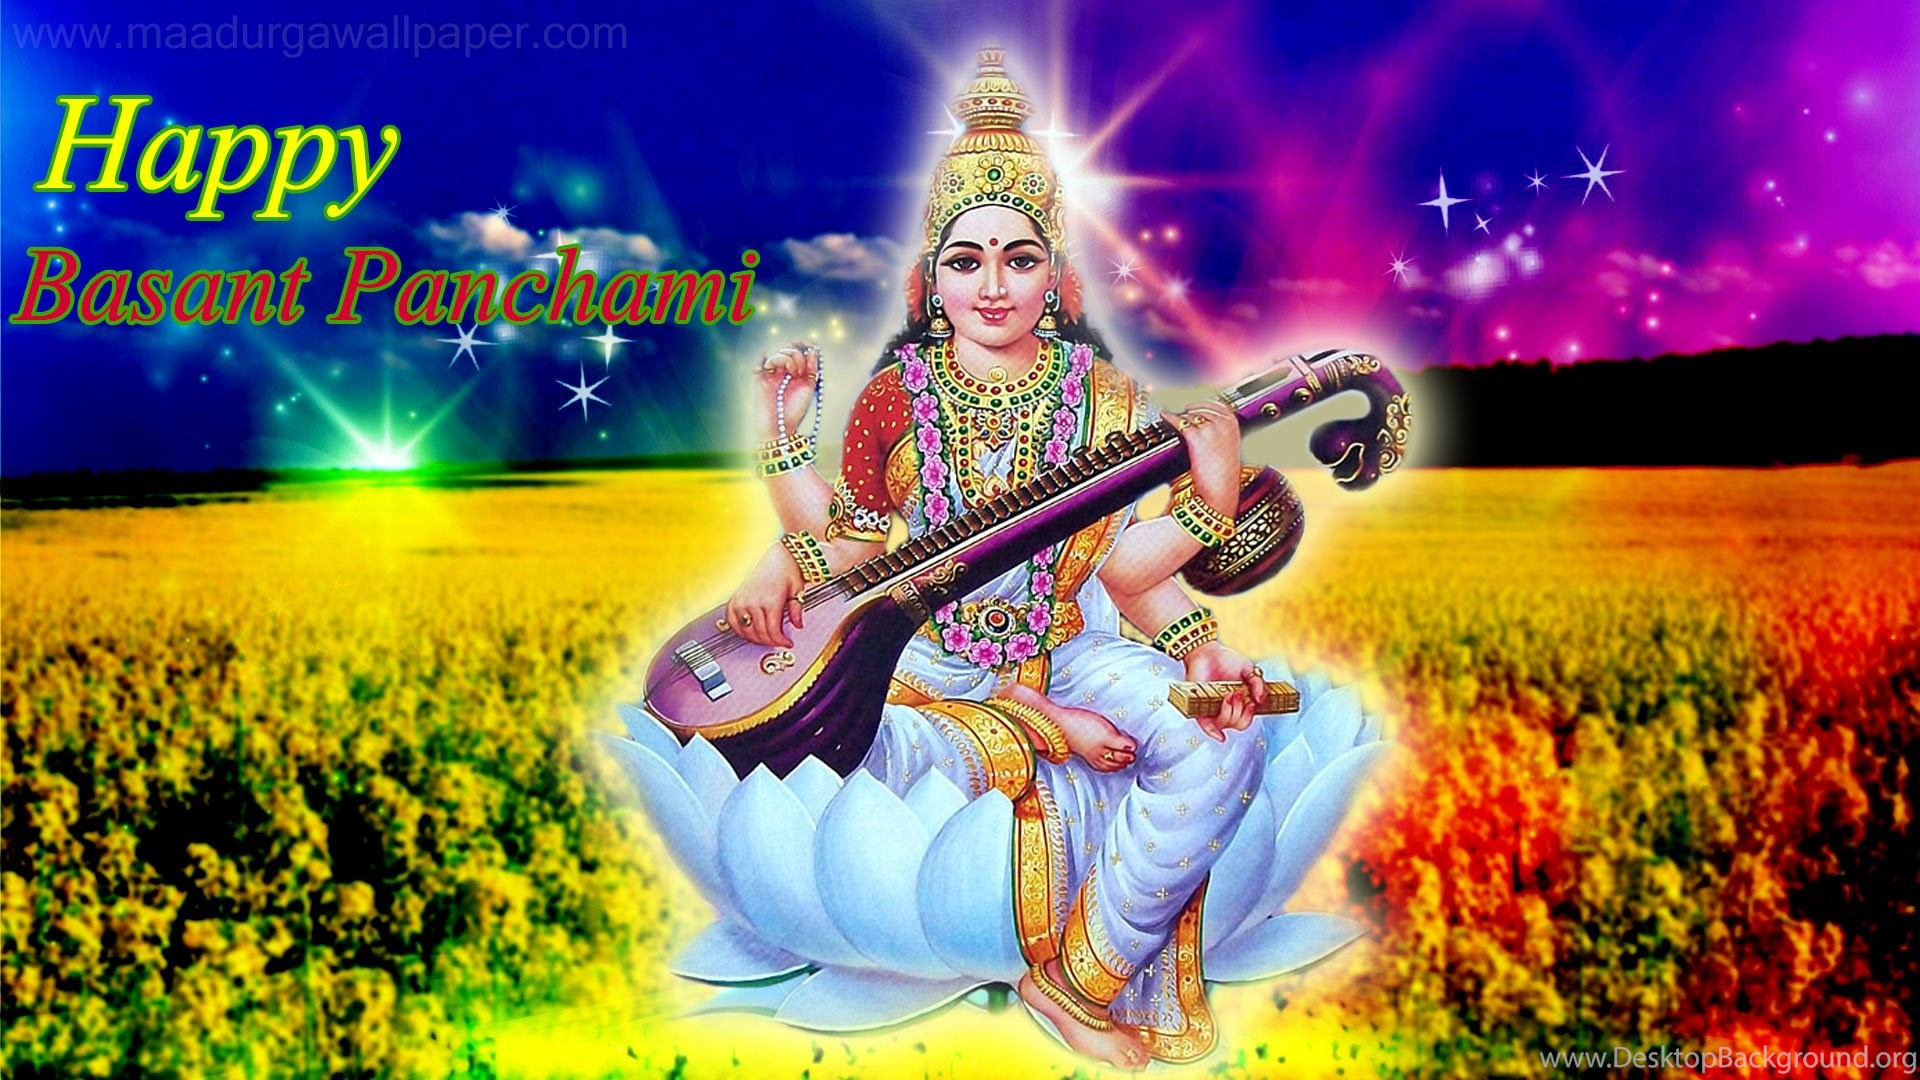 Maa Saraswati Wallpaper Images Photos Free Download Desktop